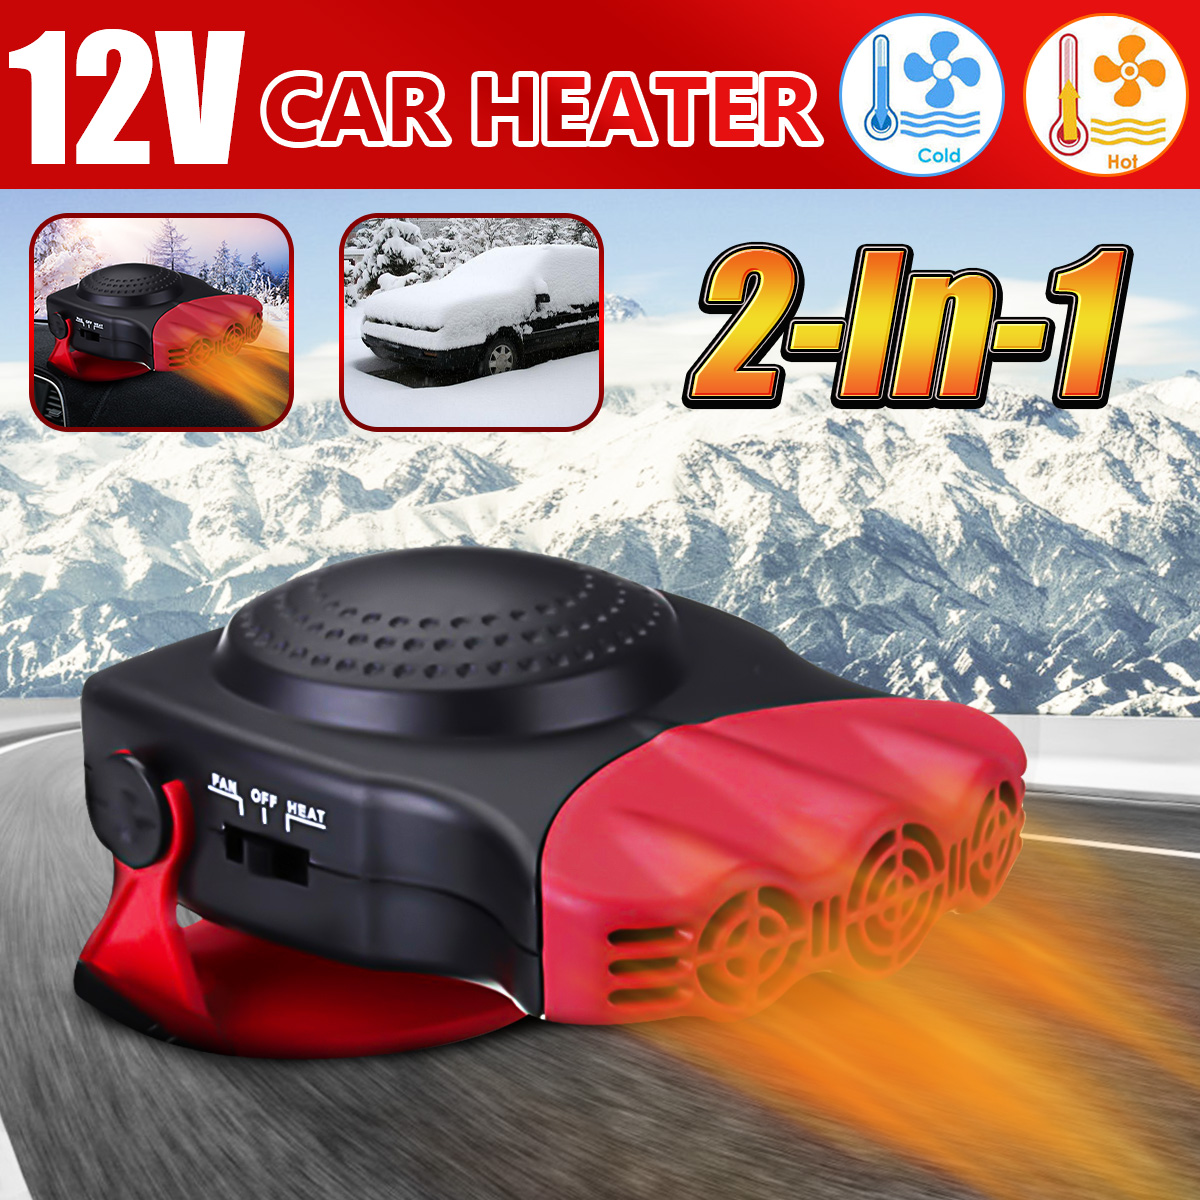 12V Car Auto Heater Cooler Dryer Plugin Demister Defroster 2 in 1 Hot Warm Fan